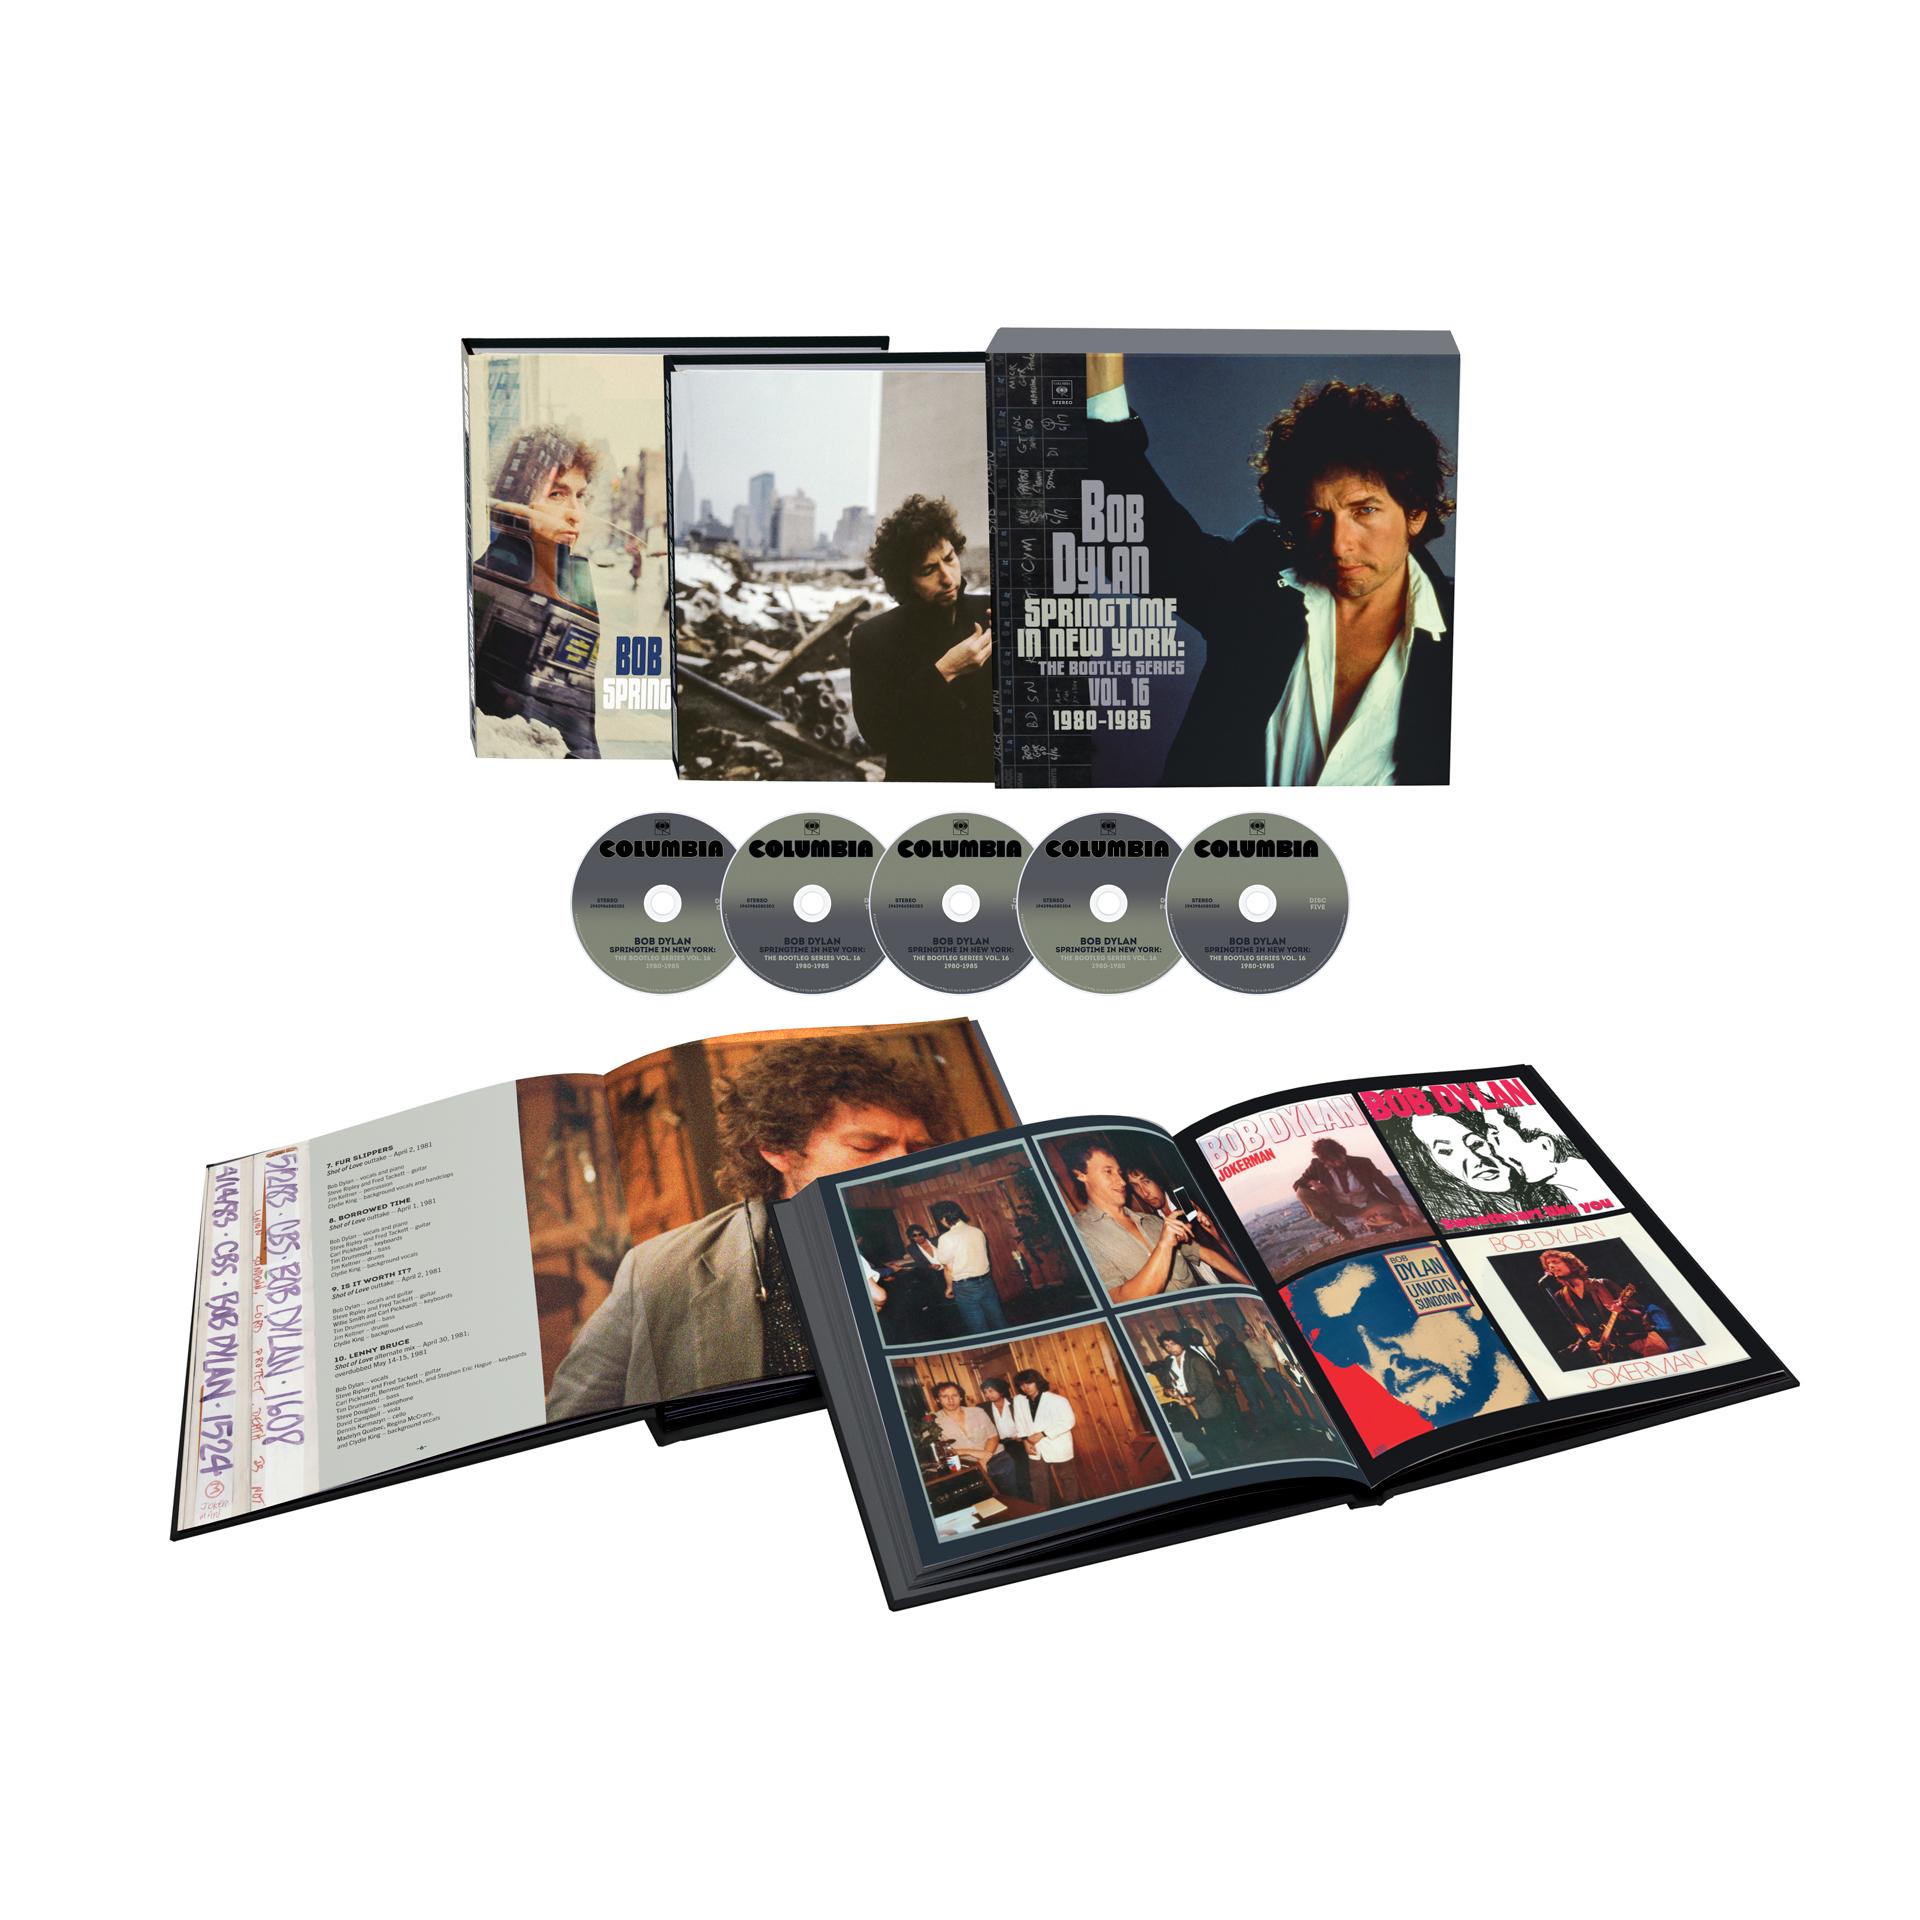 Bob Dylan - Springtime In New York: The Bootleg Series Vol. 16 (1980-1985) Deluxe CD